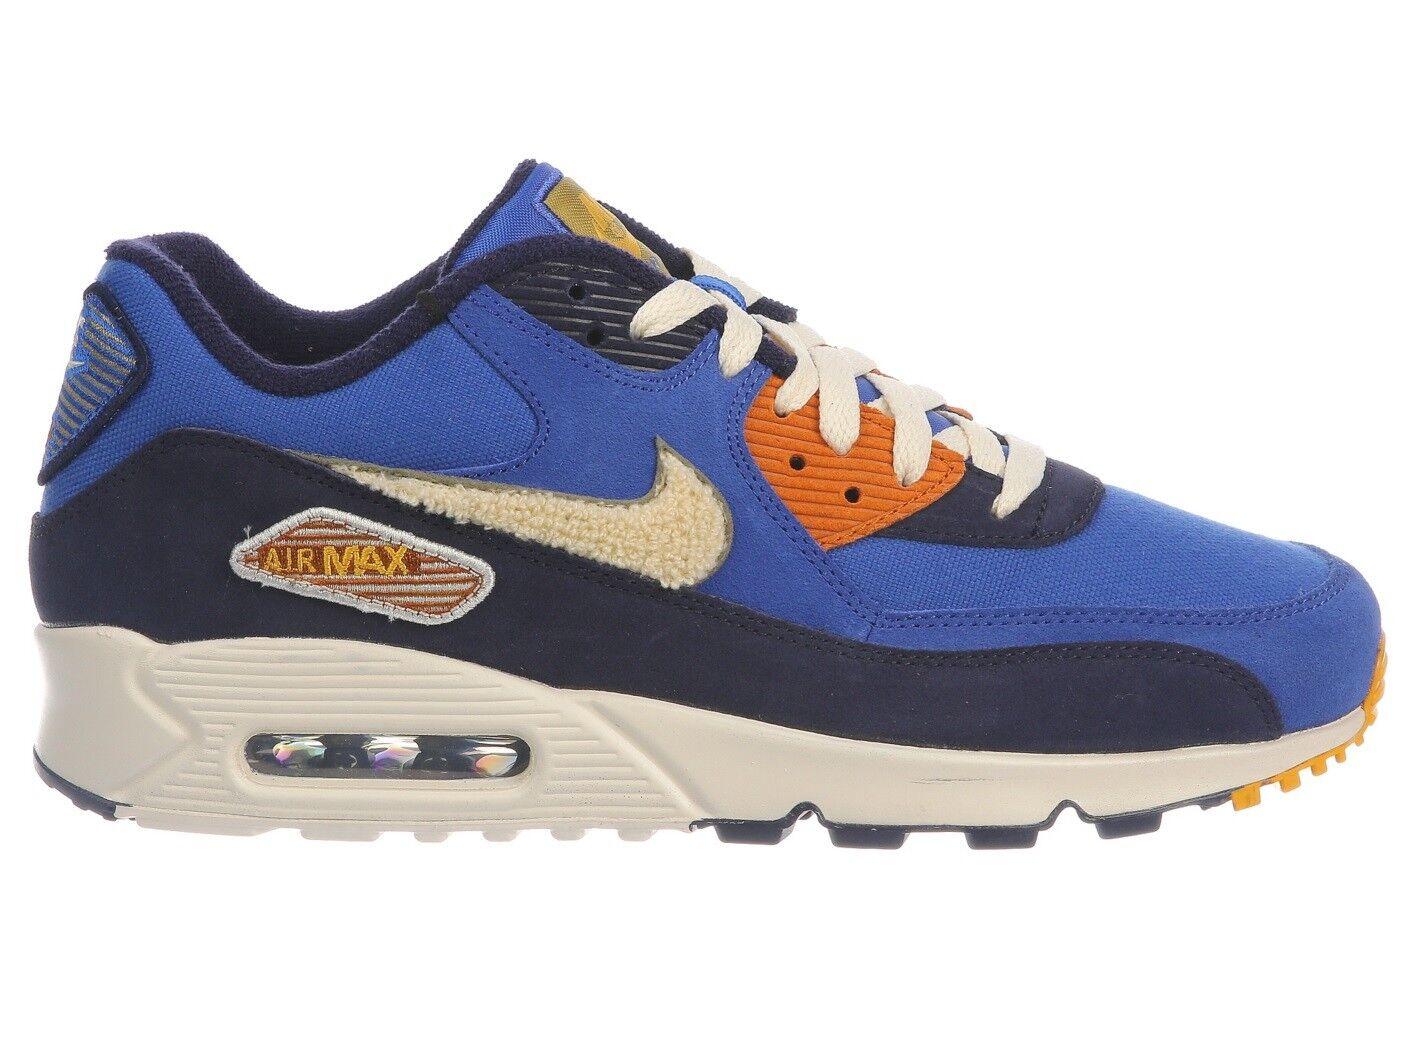 Nike Air Max 90 Premium SE Mens 858954-400 Royal Cream Running shoes Size 15